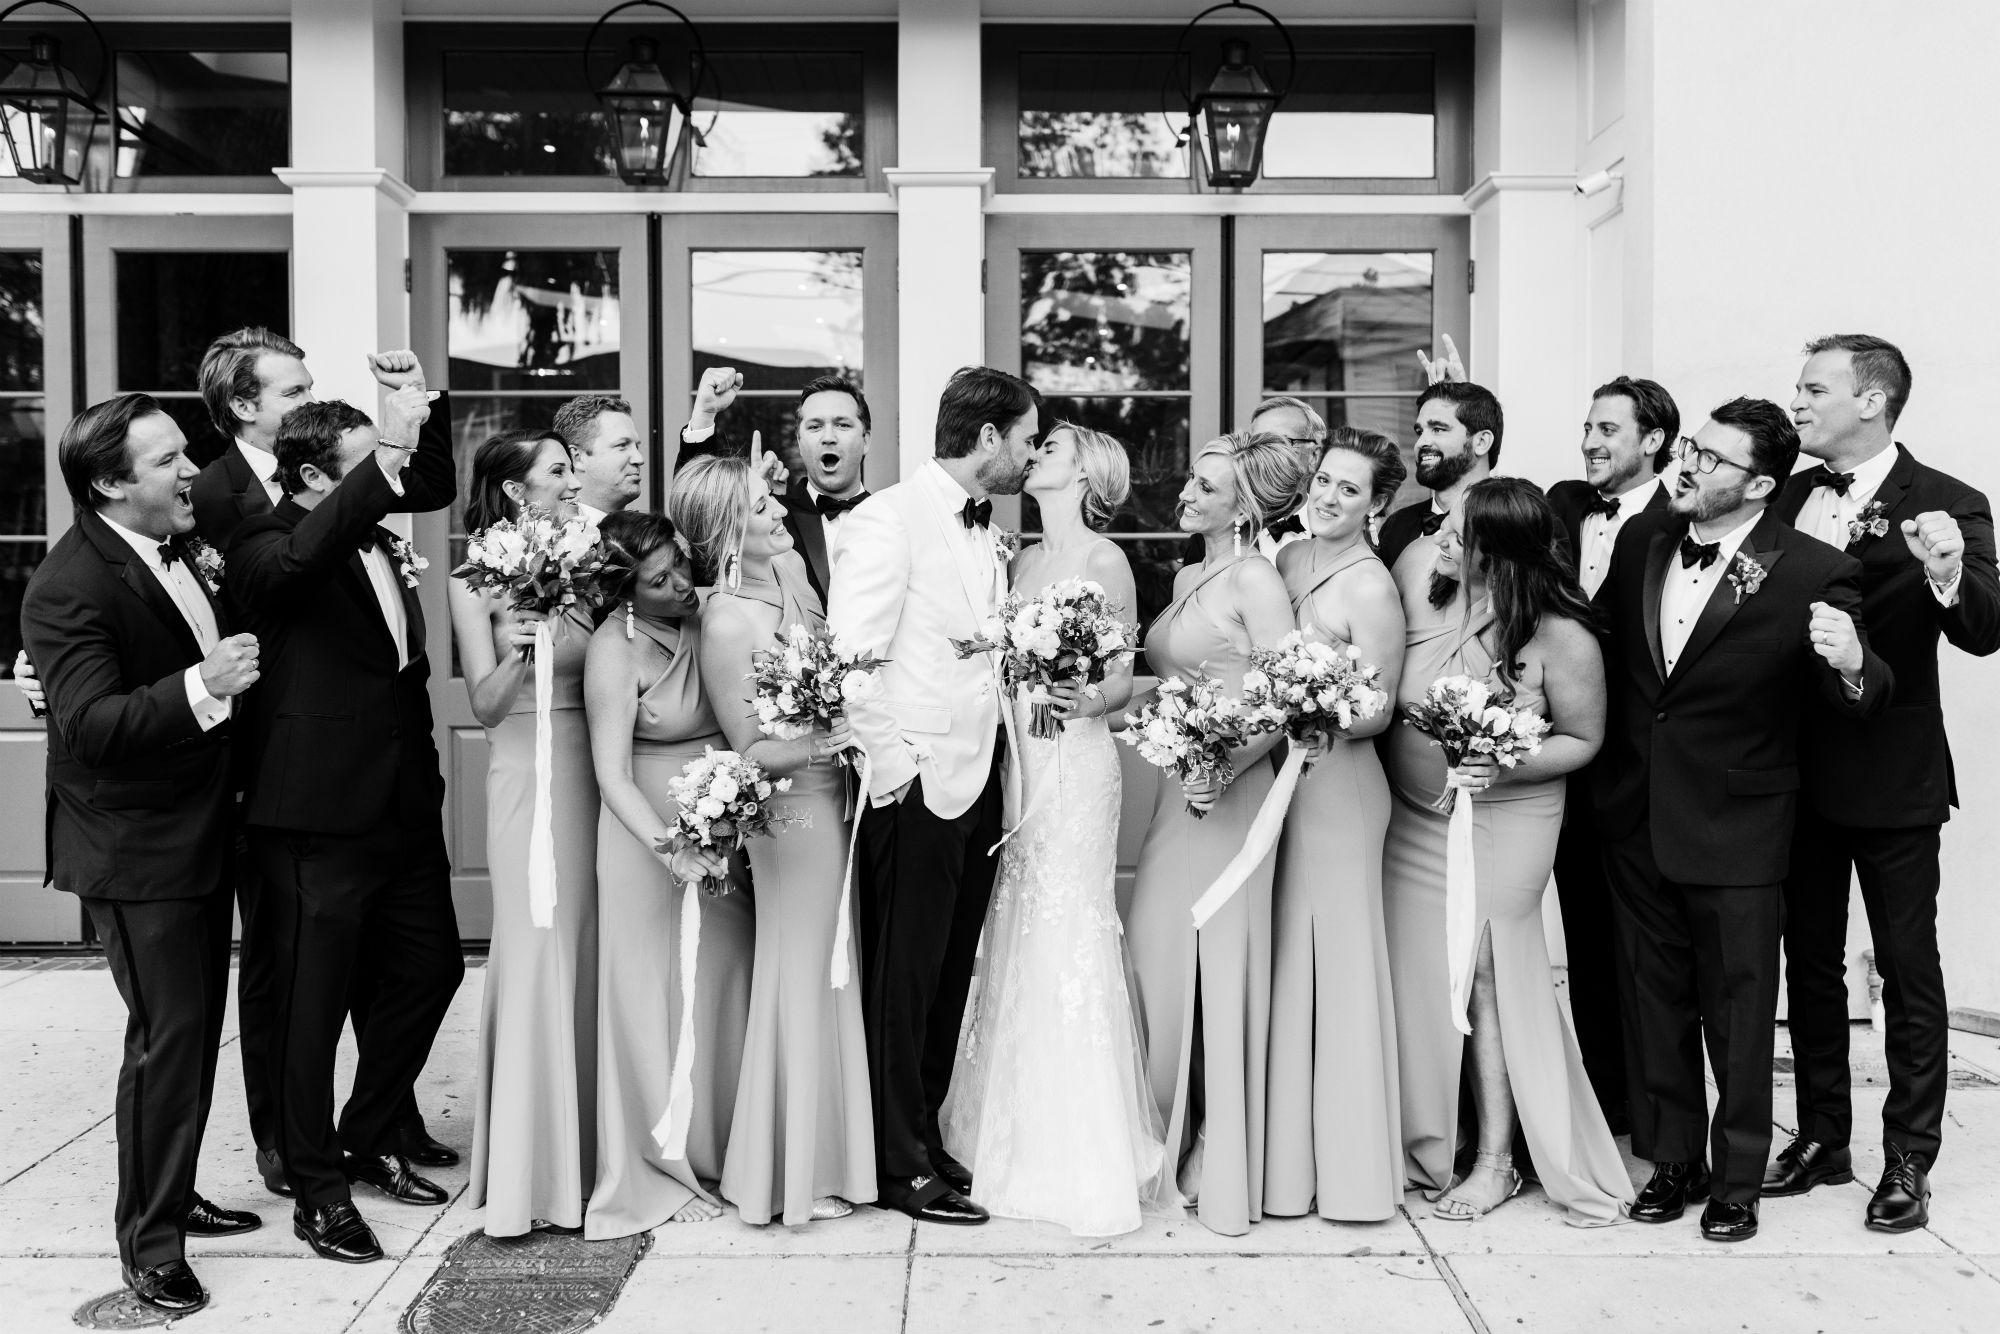 catherineannphotography-wedding-102018-saramike-229.jpg